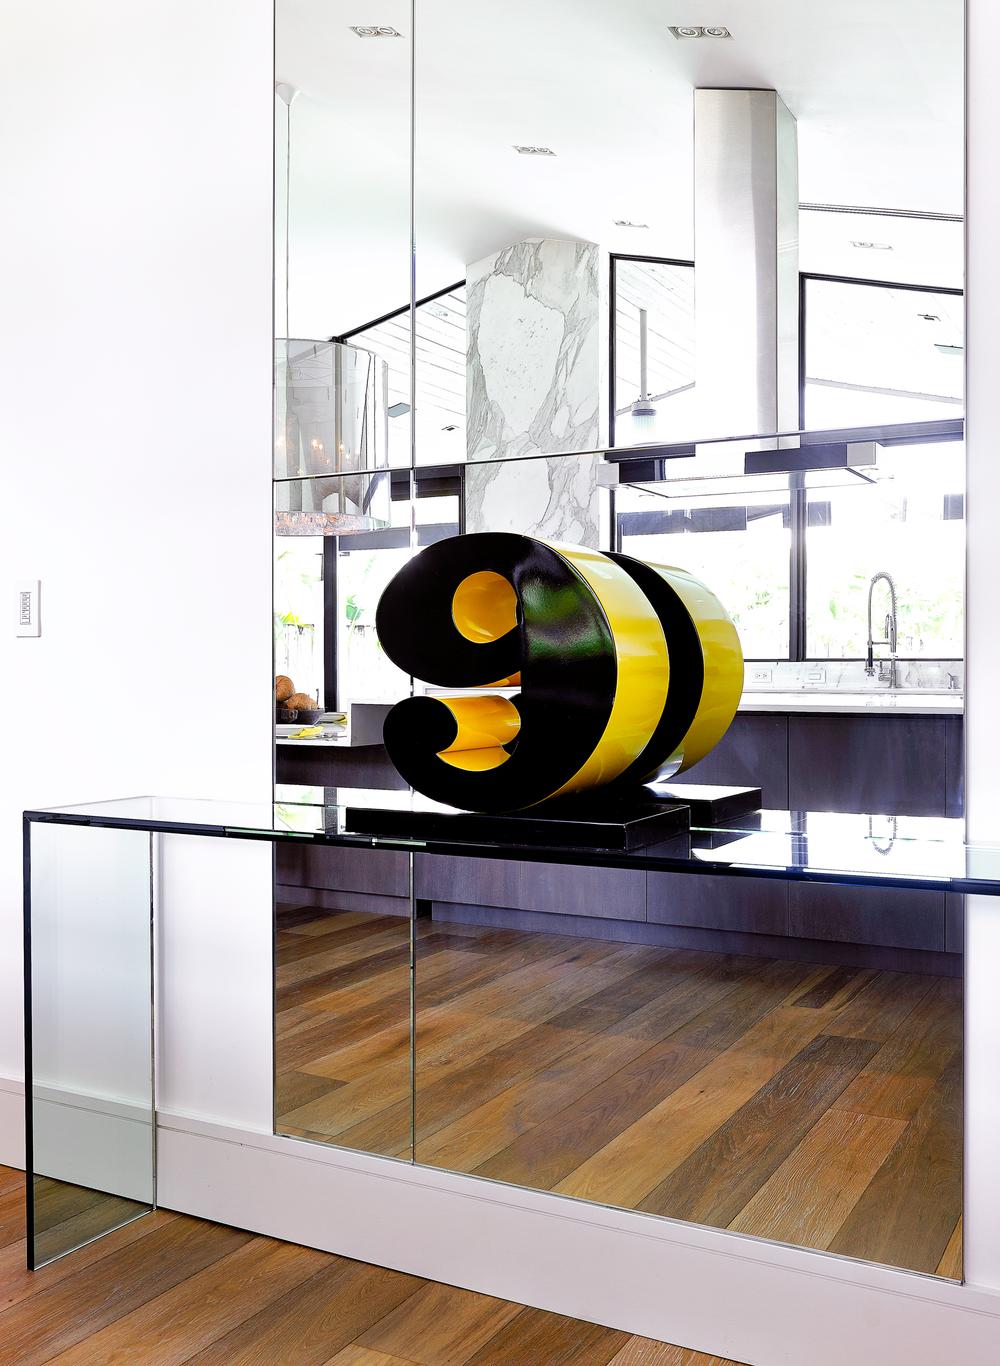 Carlos-Domenech-Brett.Giselle25464--B&G-Design---May-12-2014--025_2185.png